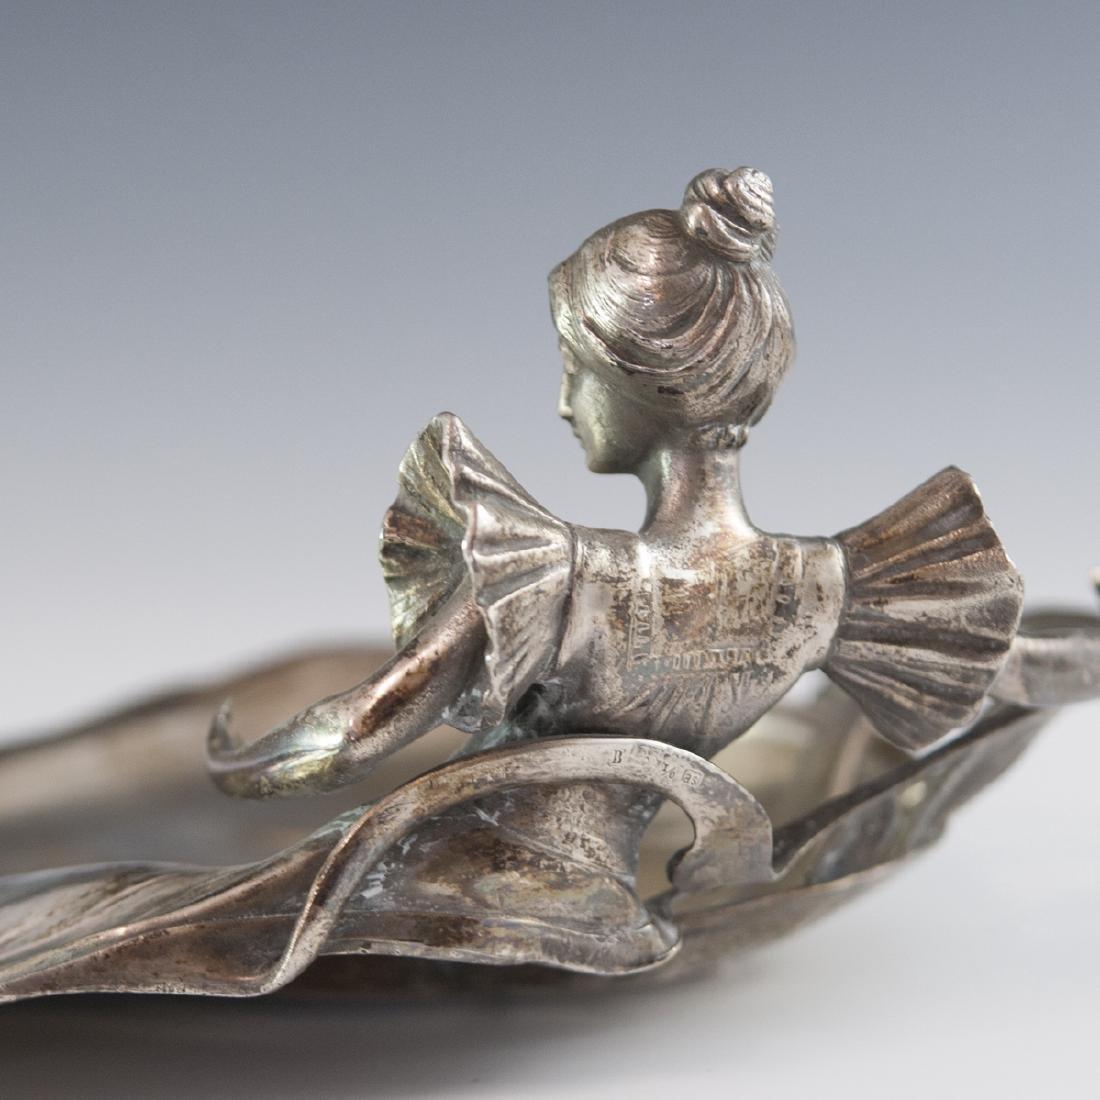 WMF Silver Plated Art Nouveau Dish - 6